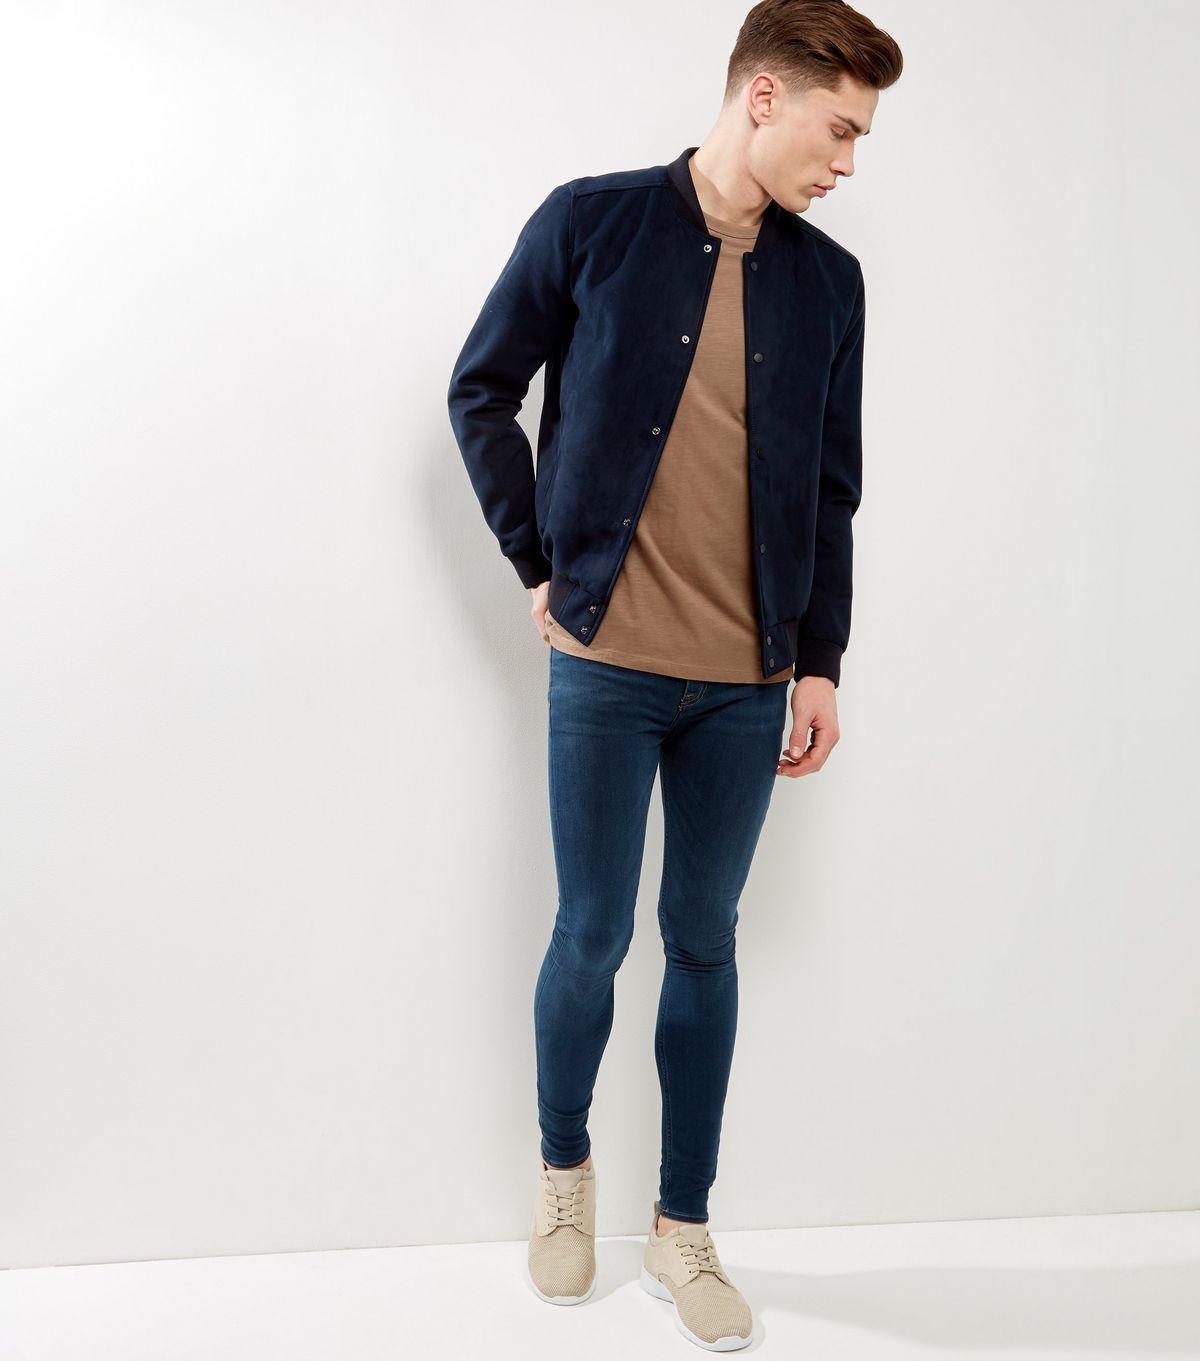 pin by skinnyjeansfetish on skinny jeans pinterest. Black Bedroom Furniture Sets. Home Design Ideas